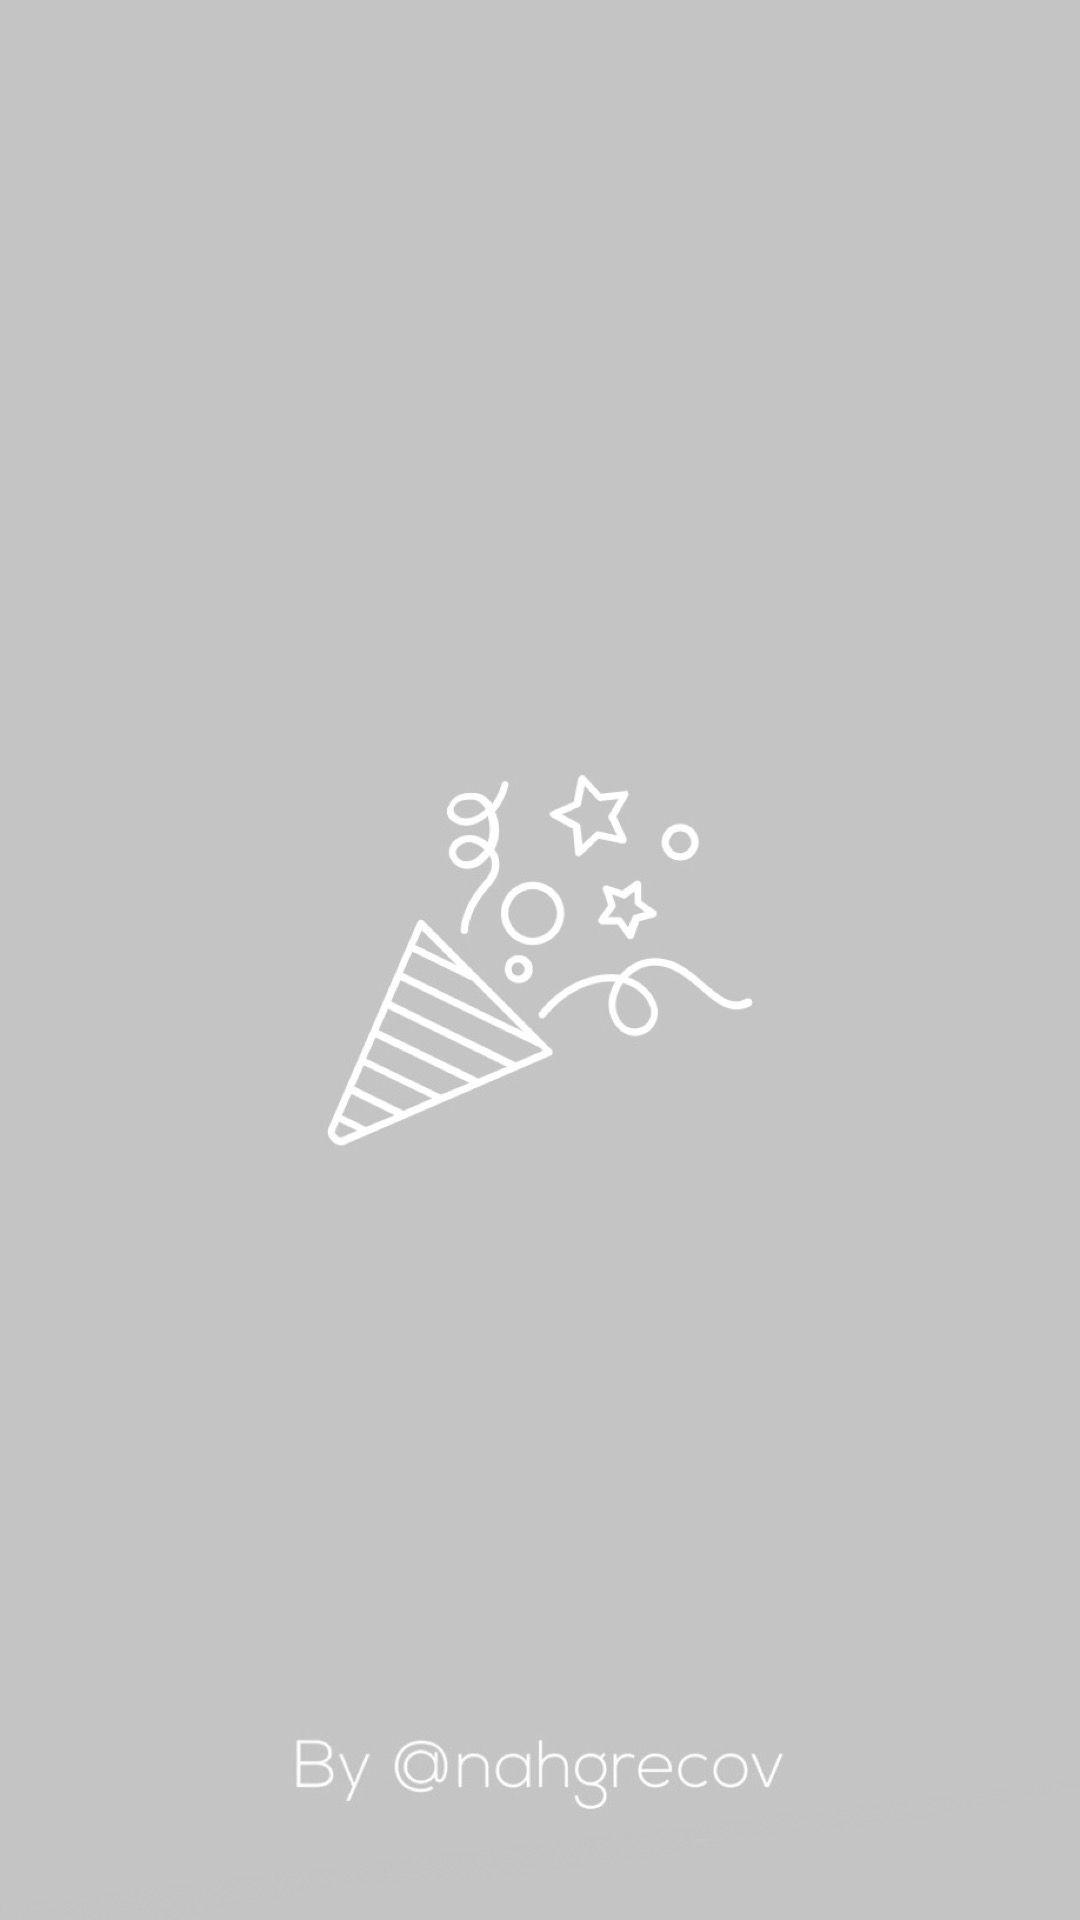 Pin by 𝒥𝑜𝓈𝒾𝑒 𝒜𝓊𝓈𝓉𝑒𝓃 on Wallpaper | Instagram